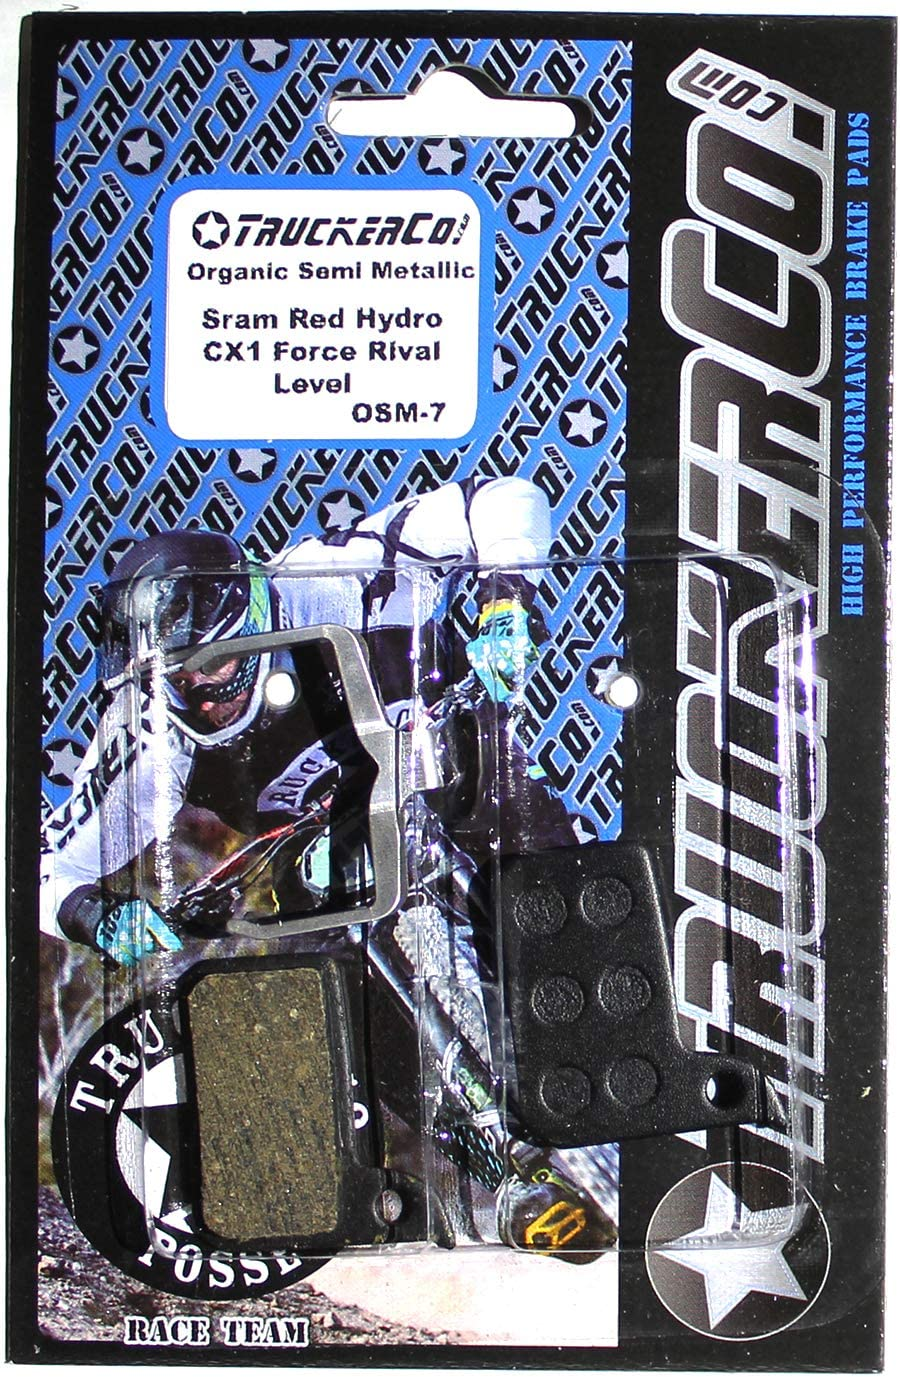 Jagwire Sport Semi//Metallic Disc Bicycle Brake Pad fits Shimano Road//CX RS805 RS